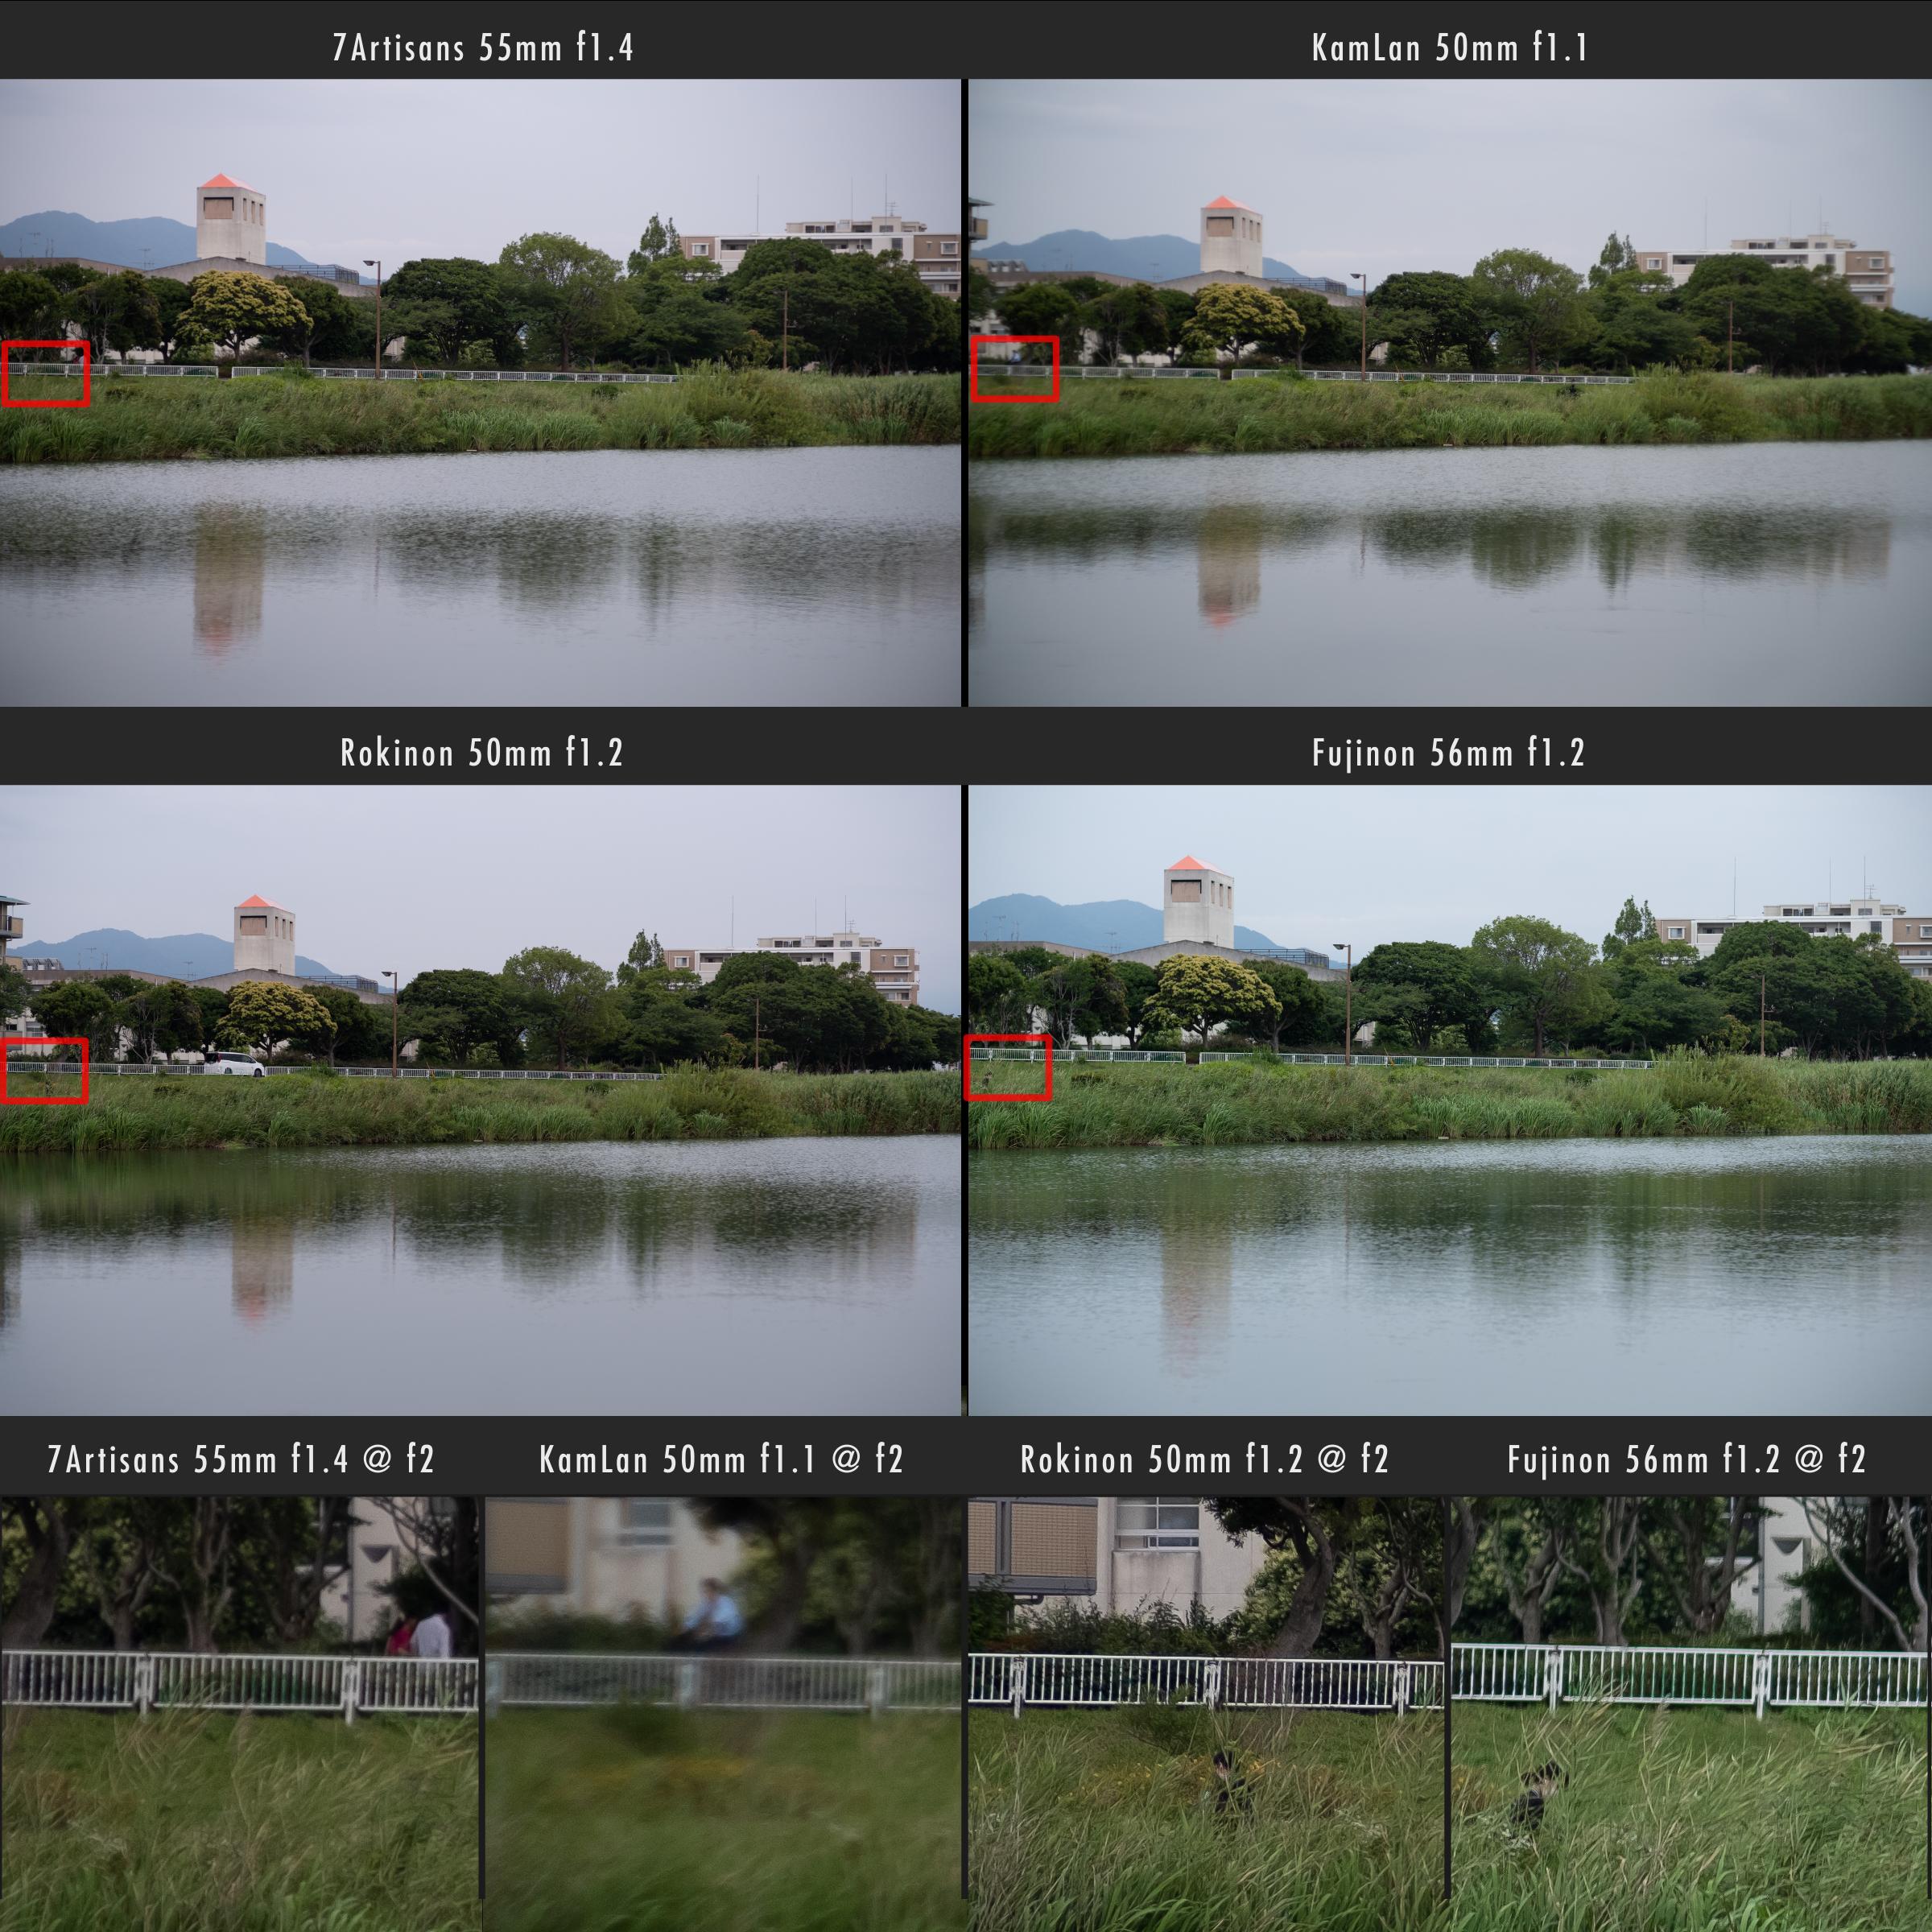 Kamlan 50mm f1.1 vs 7Artisans 55mm f1.4 vs Rokinon 50mm f1.2 Edge Sharpness Comparison